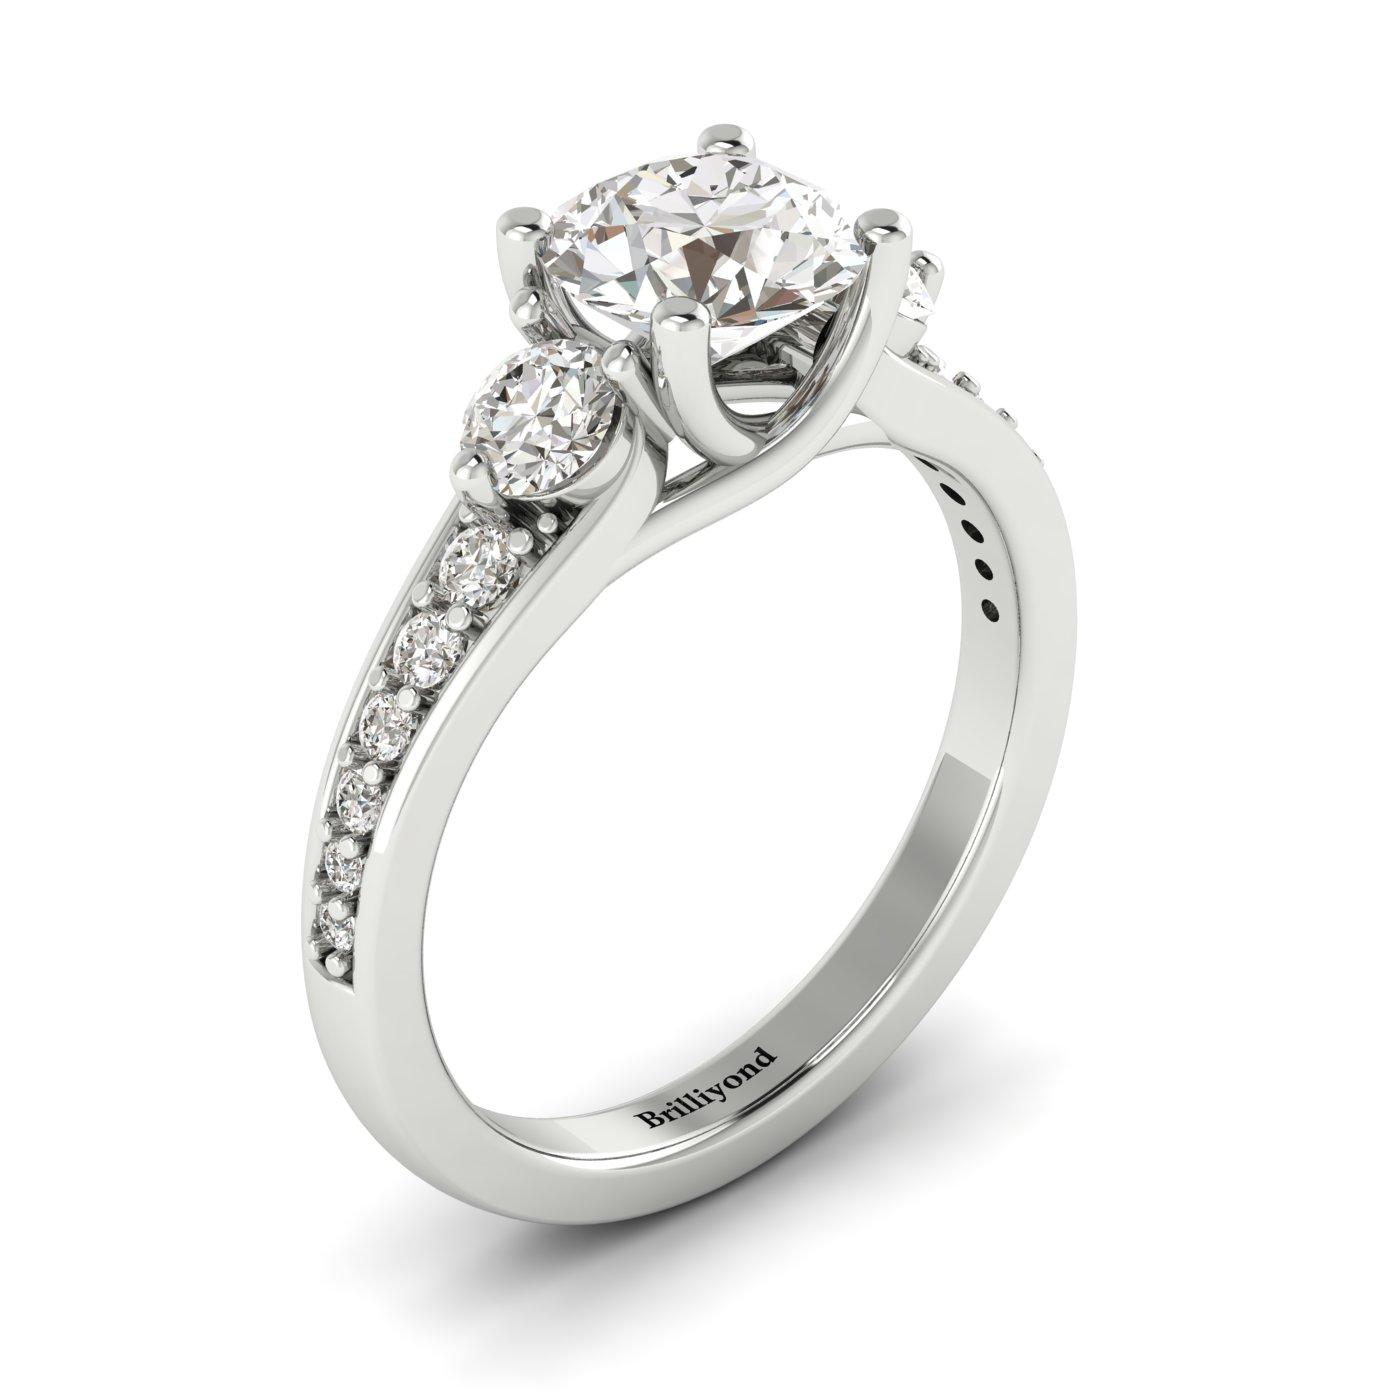 Diamond White Gold Three Stone Engagement Ring Sorento_image2